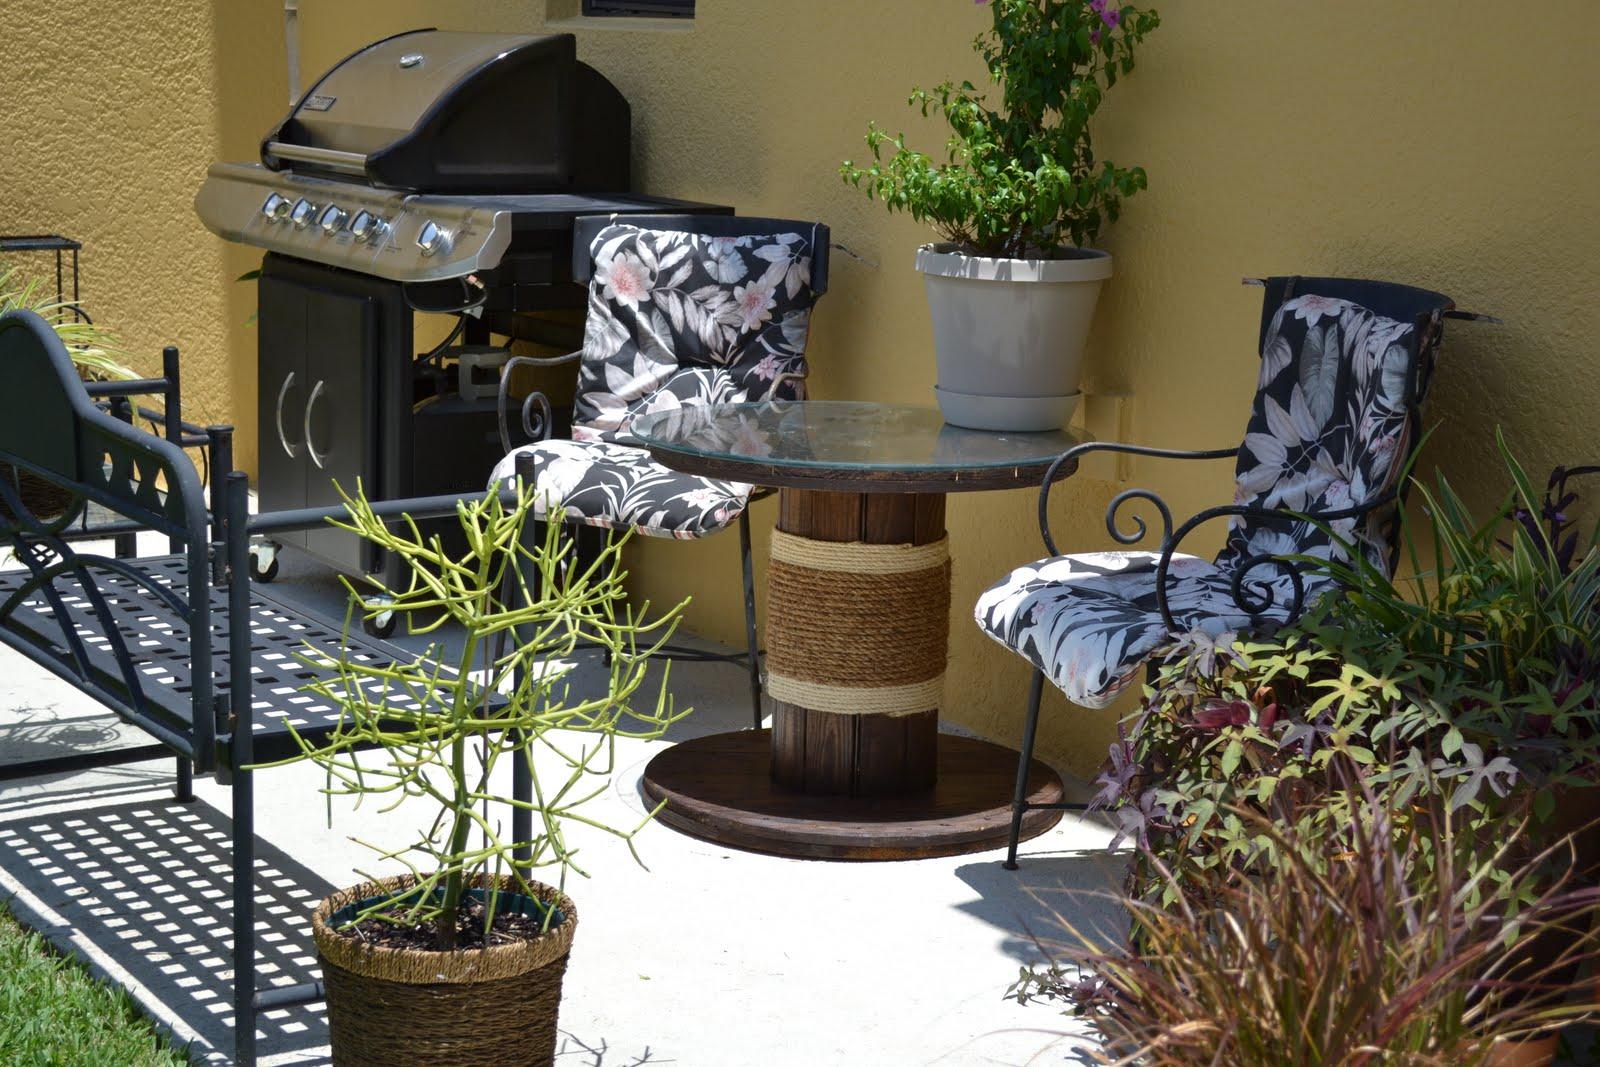 camelot art creations ballard designs inspired patio table no plant in the far corner